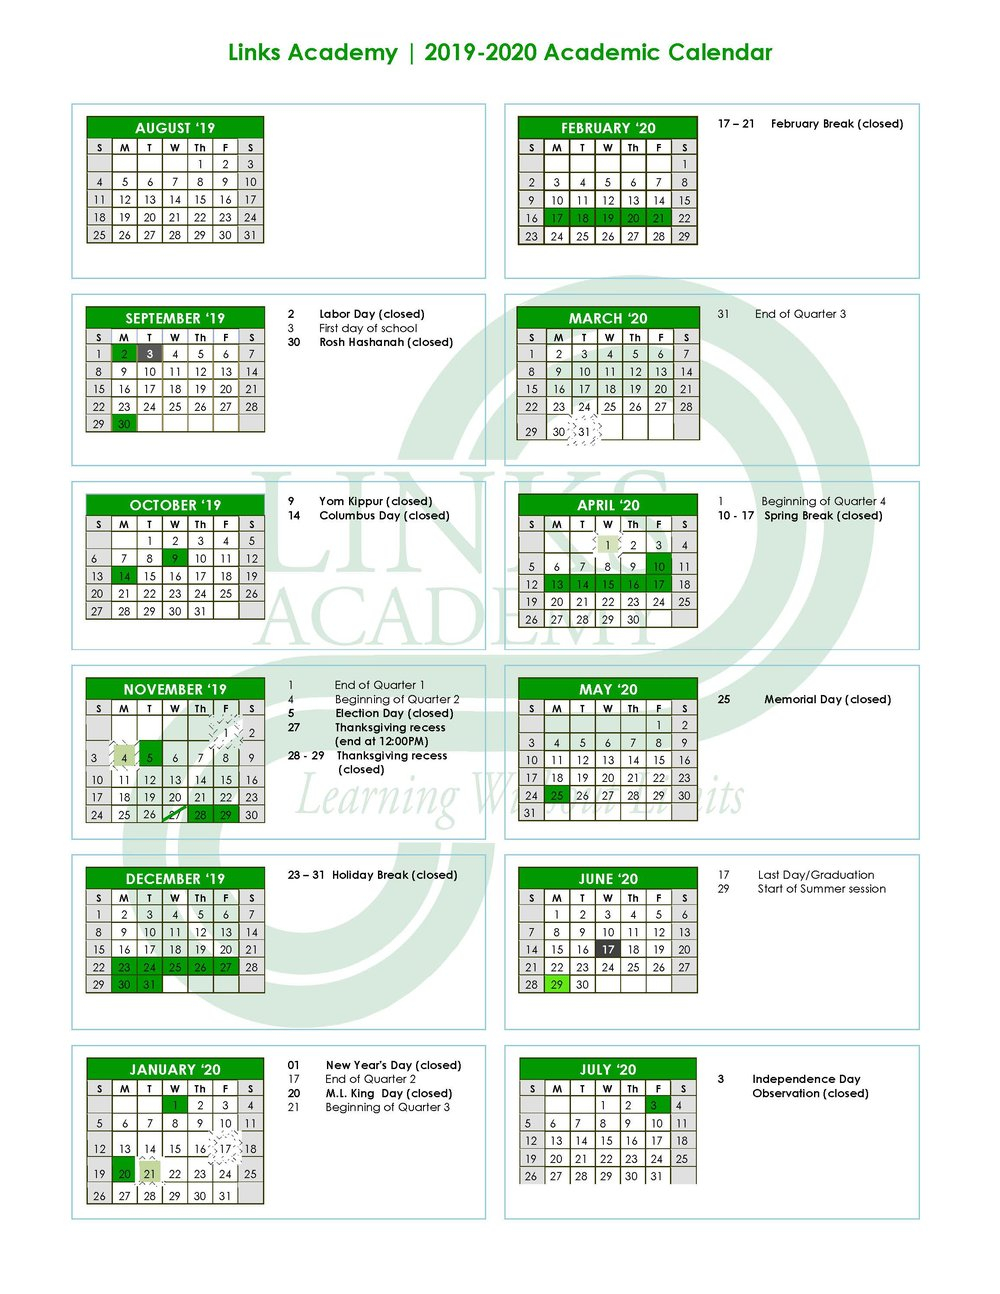 Academic Calendar — Links Academy Intended For Naugatuck Valley Community College Calendar